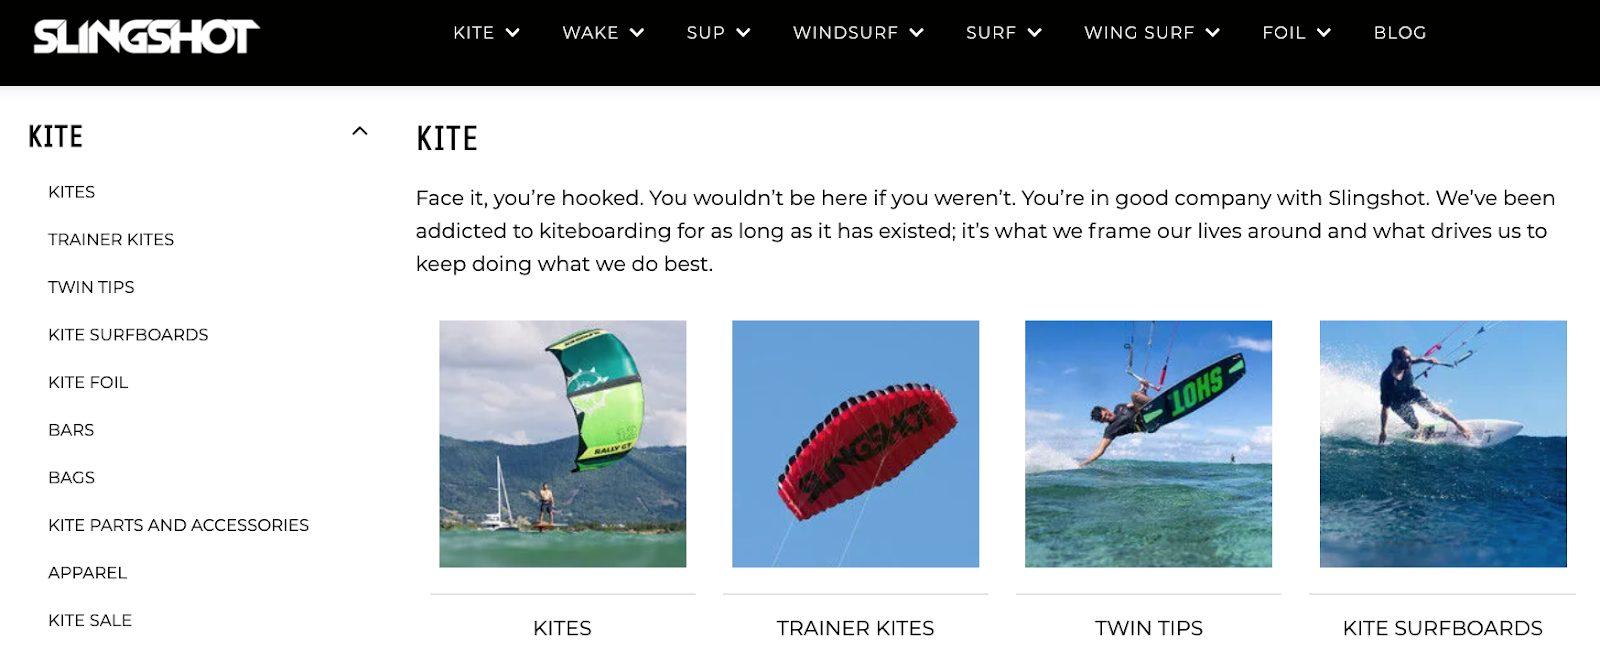 top suitecommerce merchandising features category landing page